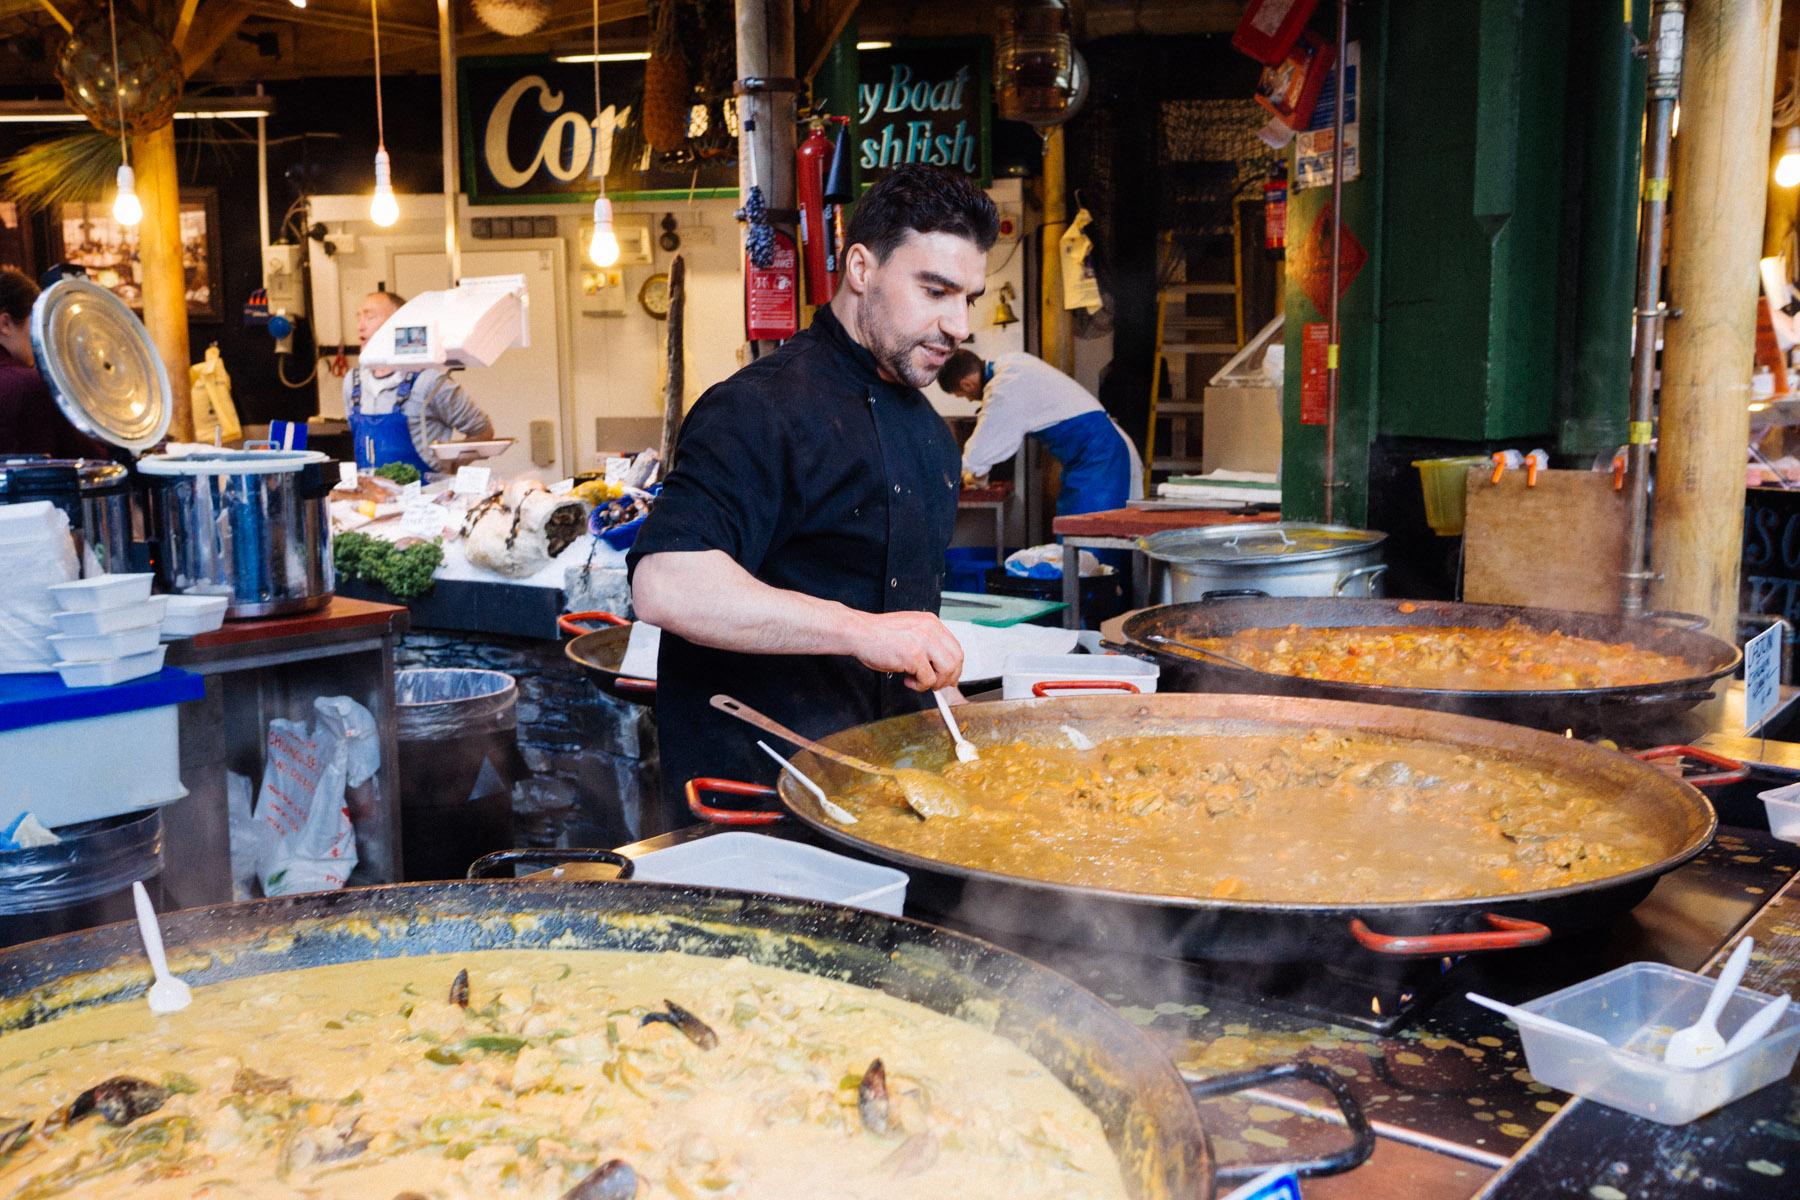 Borough Market: London's Largest & Oldest Food Market ...